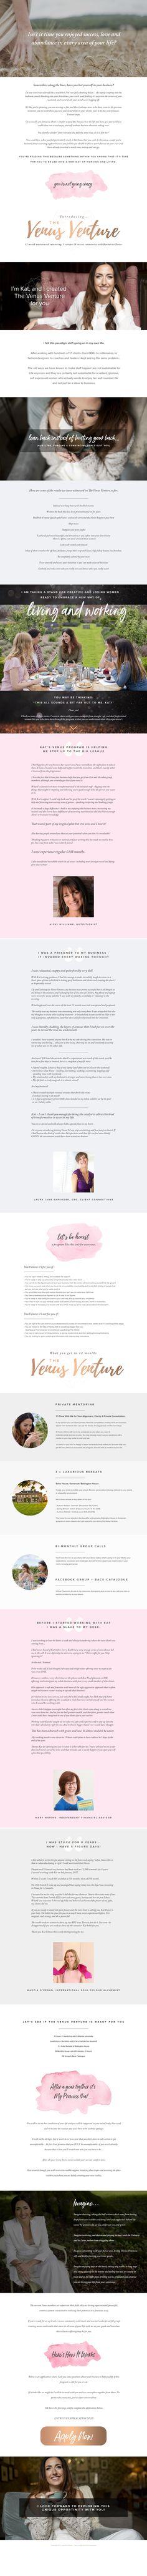 Sales Page I designed for The Venus Venture mastermind for women entrepreneurs Marketing Ideas, Marketing Tools, Business Marketing, Page Design, My Design, Entrepreneur, Branding, Venus, Content